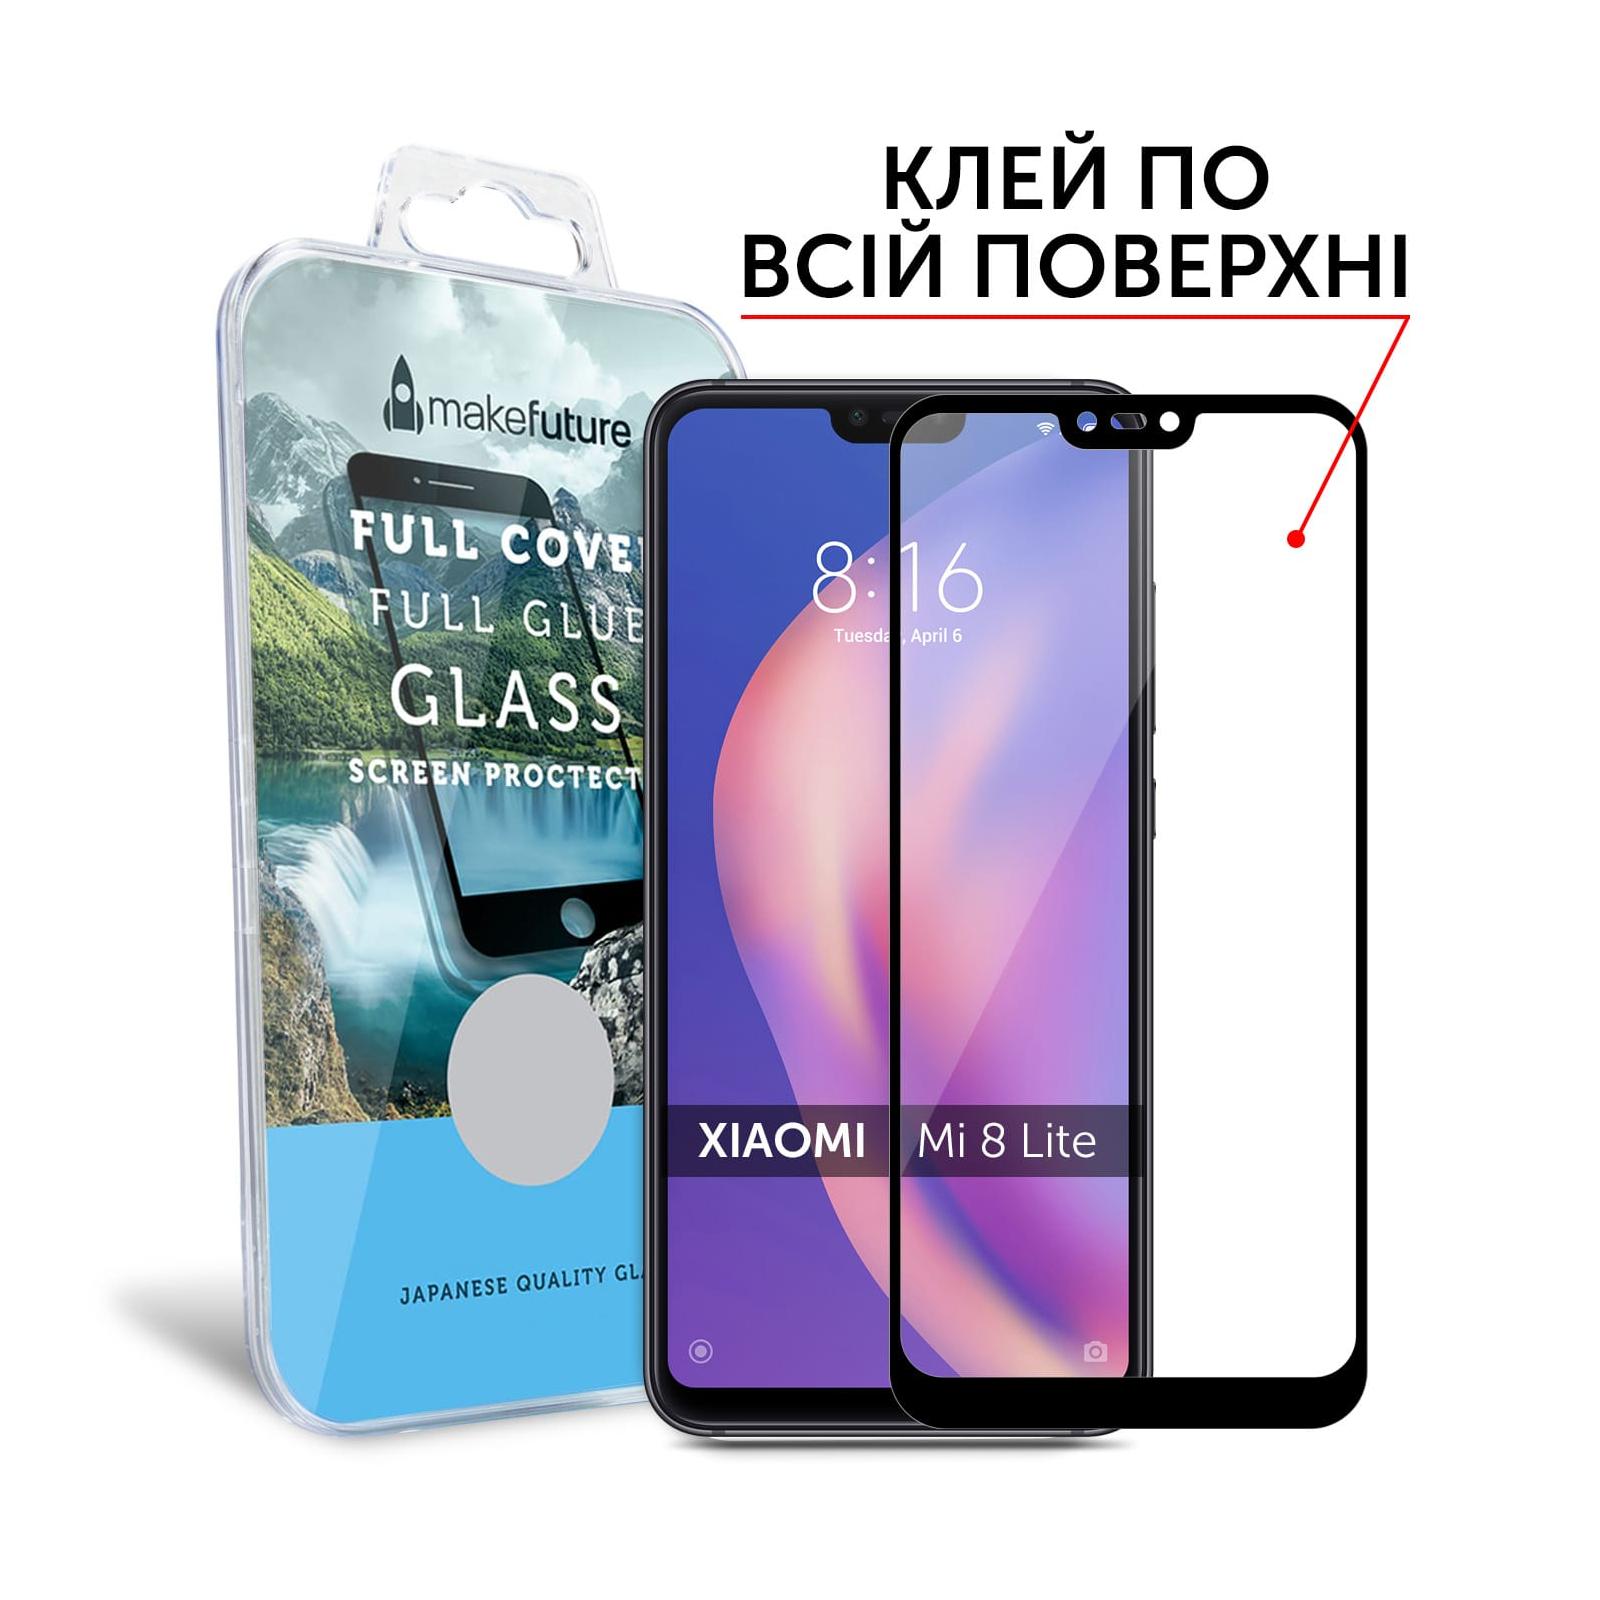 Стекло защитное MakeFuture для Xiaomi Mi8 Lite Black Full Cover Full Glue (MGFCFG-XM8LB) изображение 3